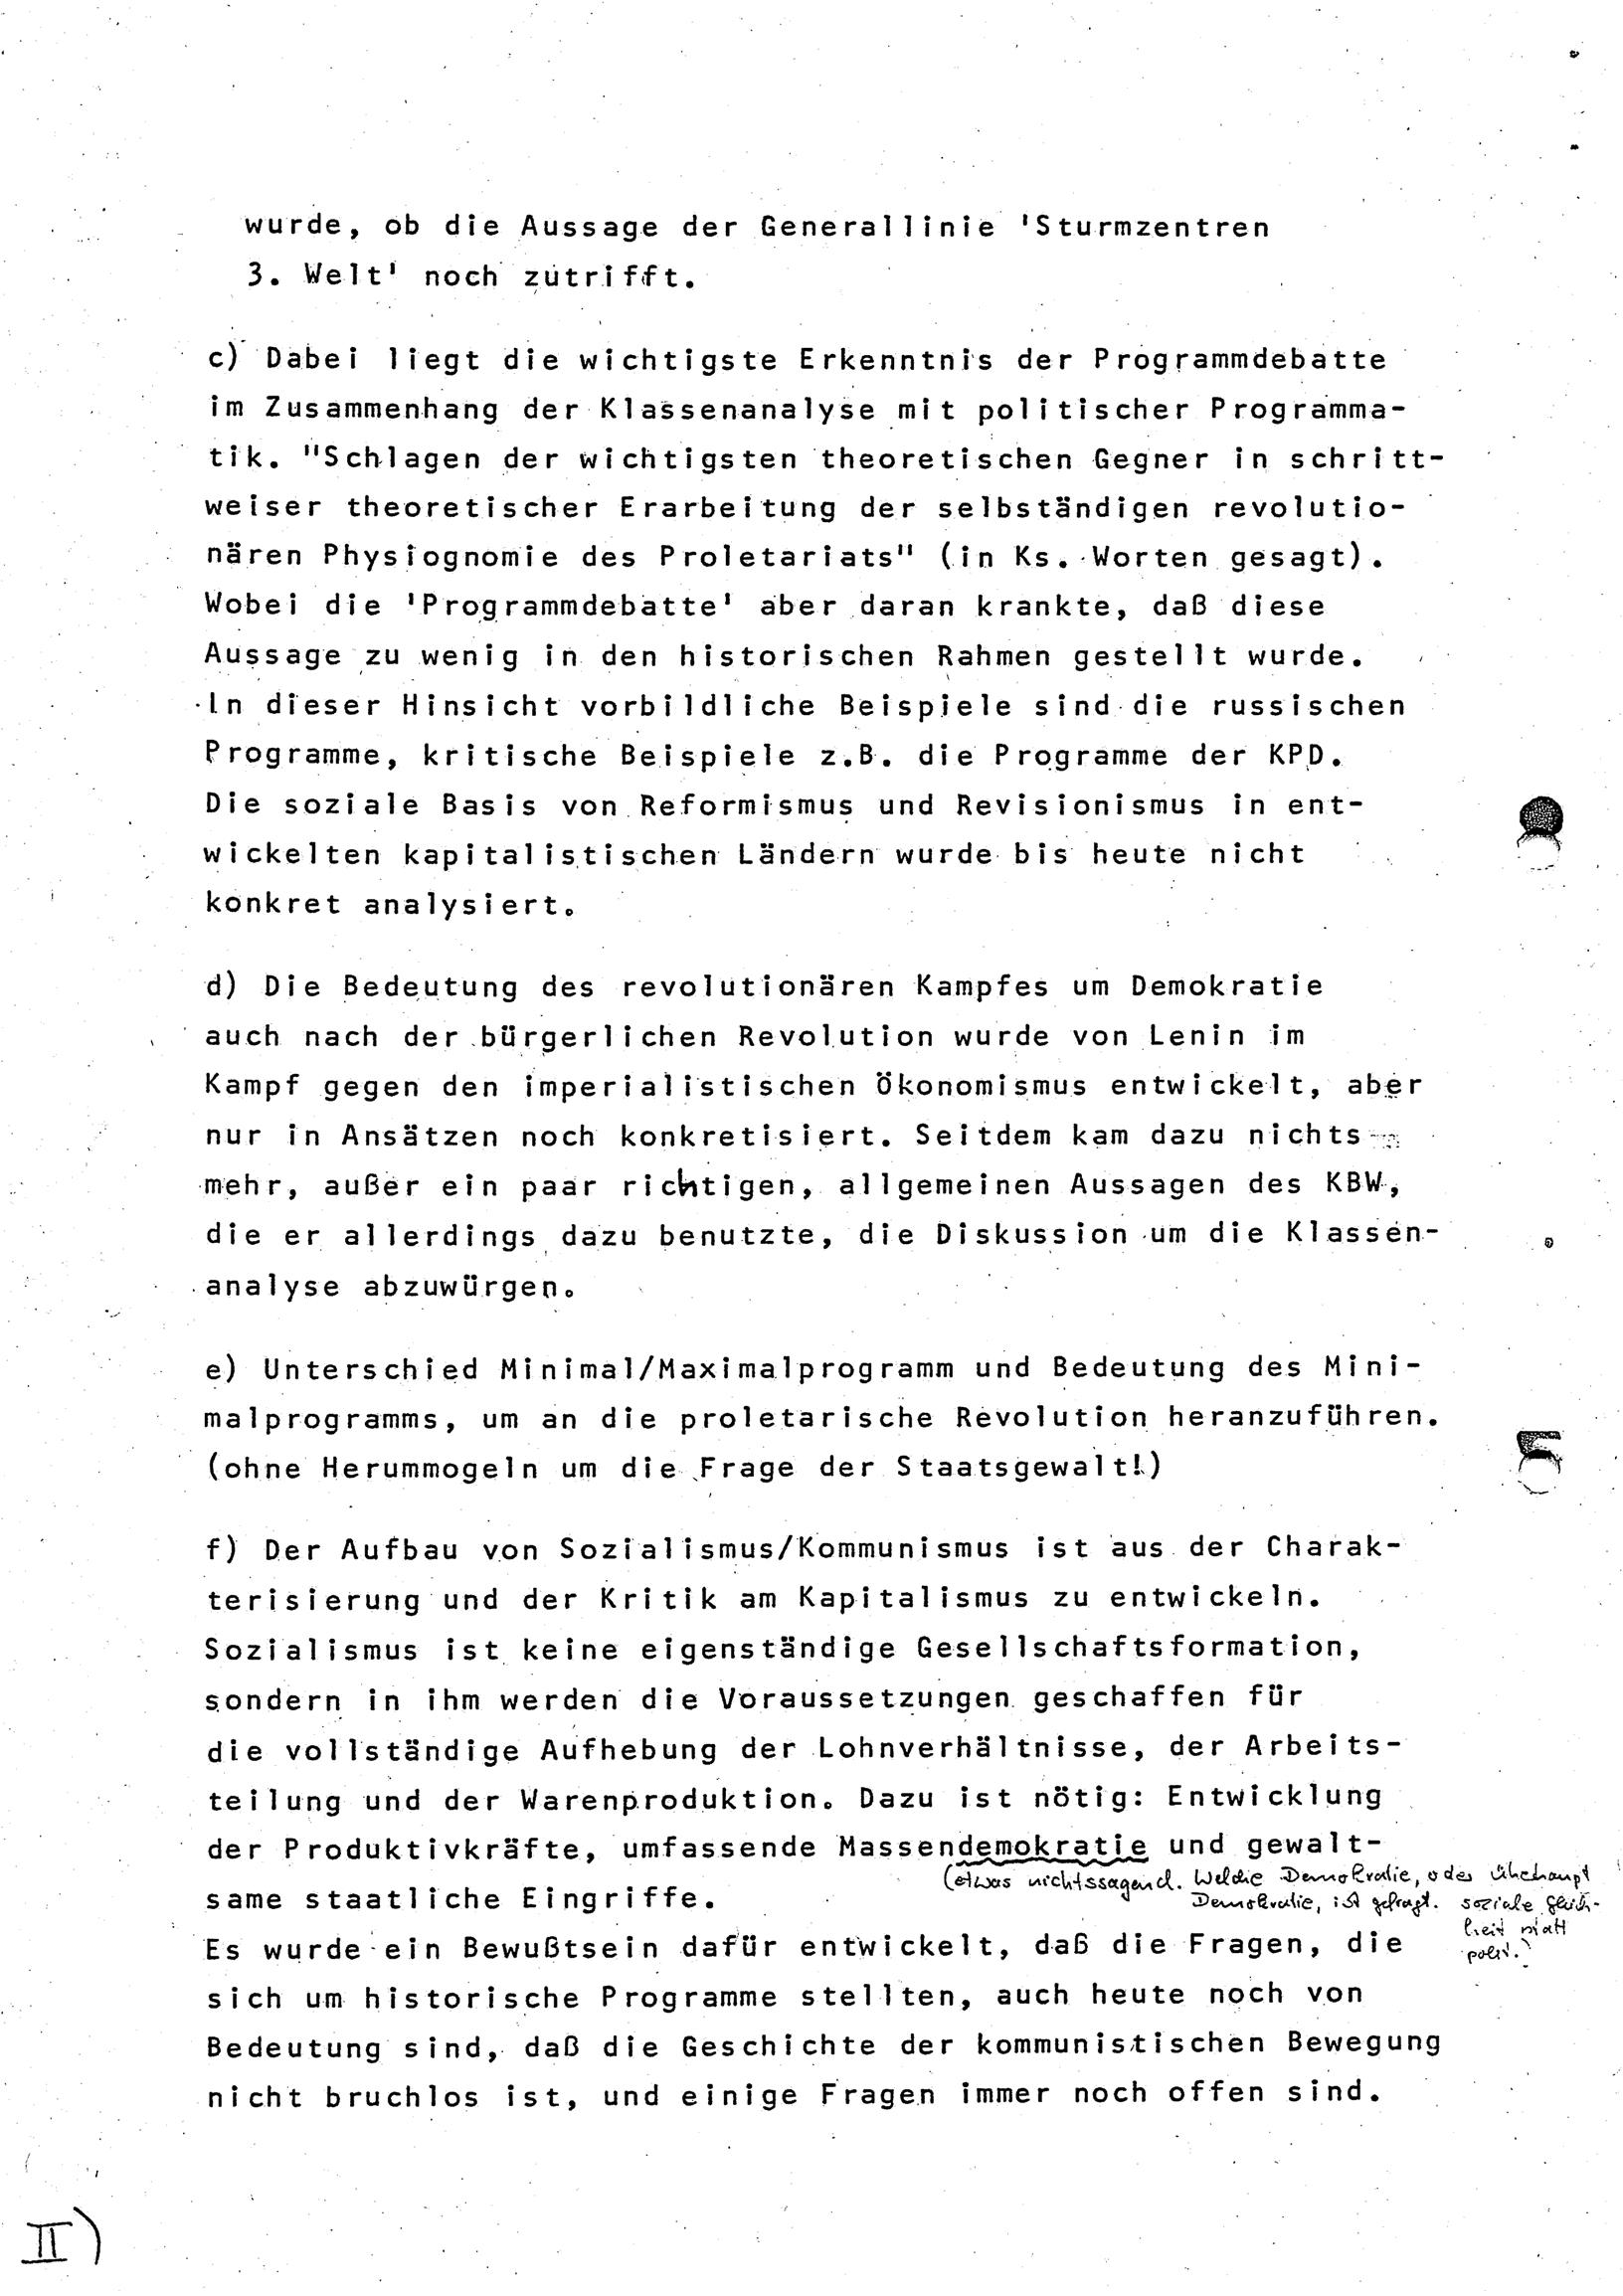 Ulm_KGU_Arbeitsheft_19830425_015_062